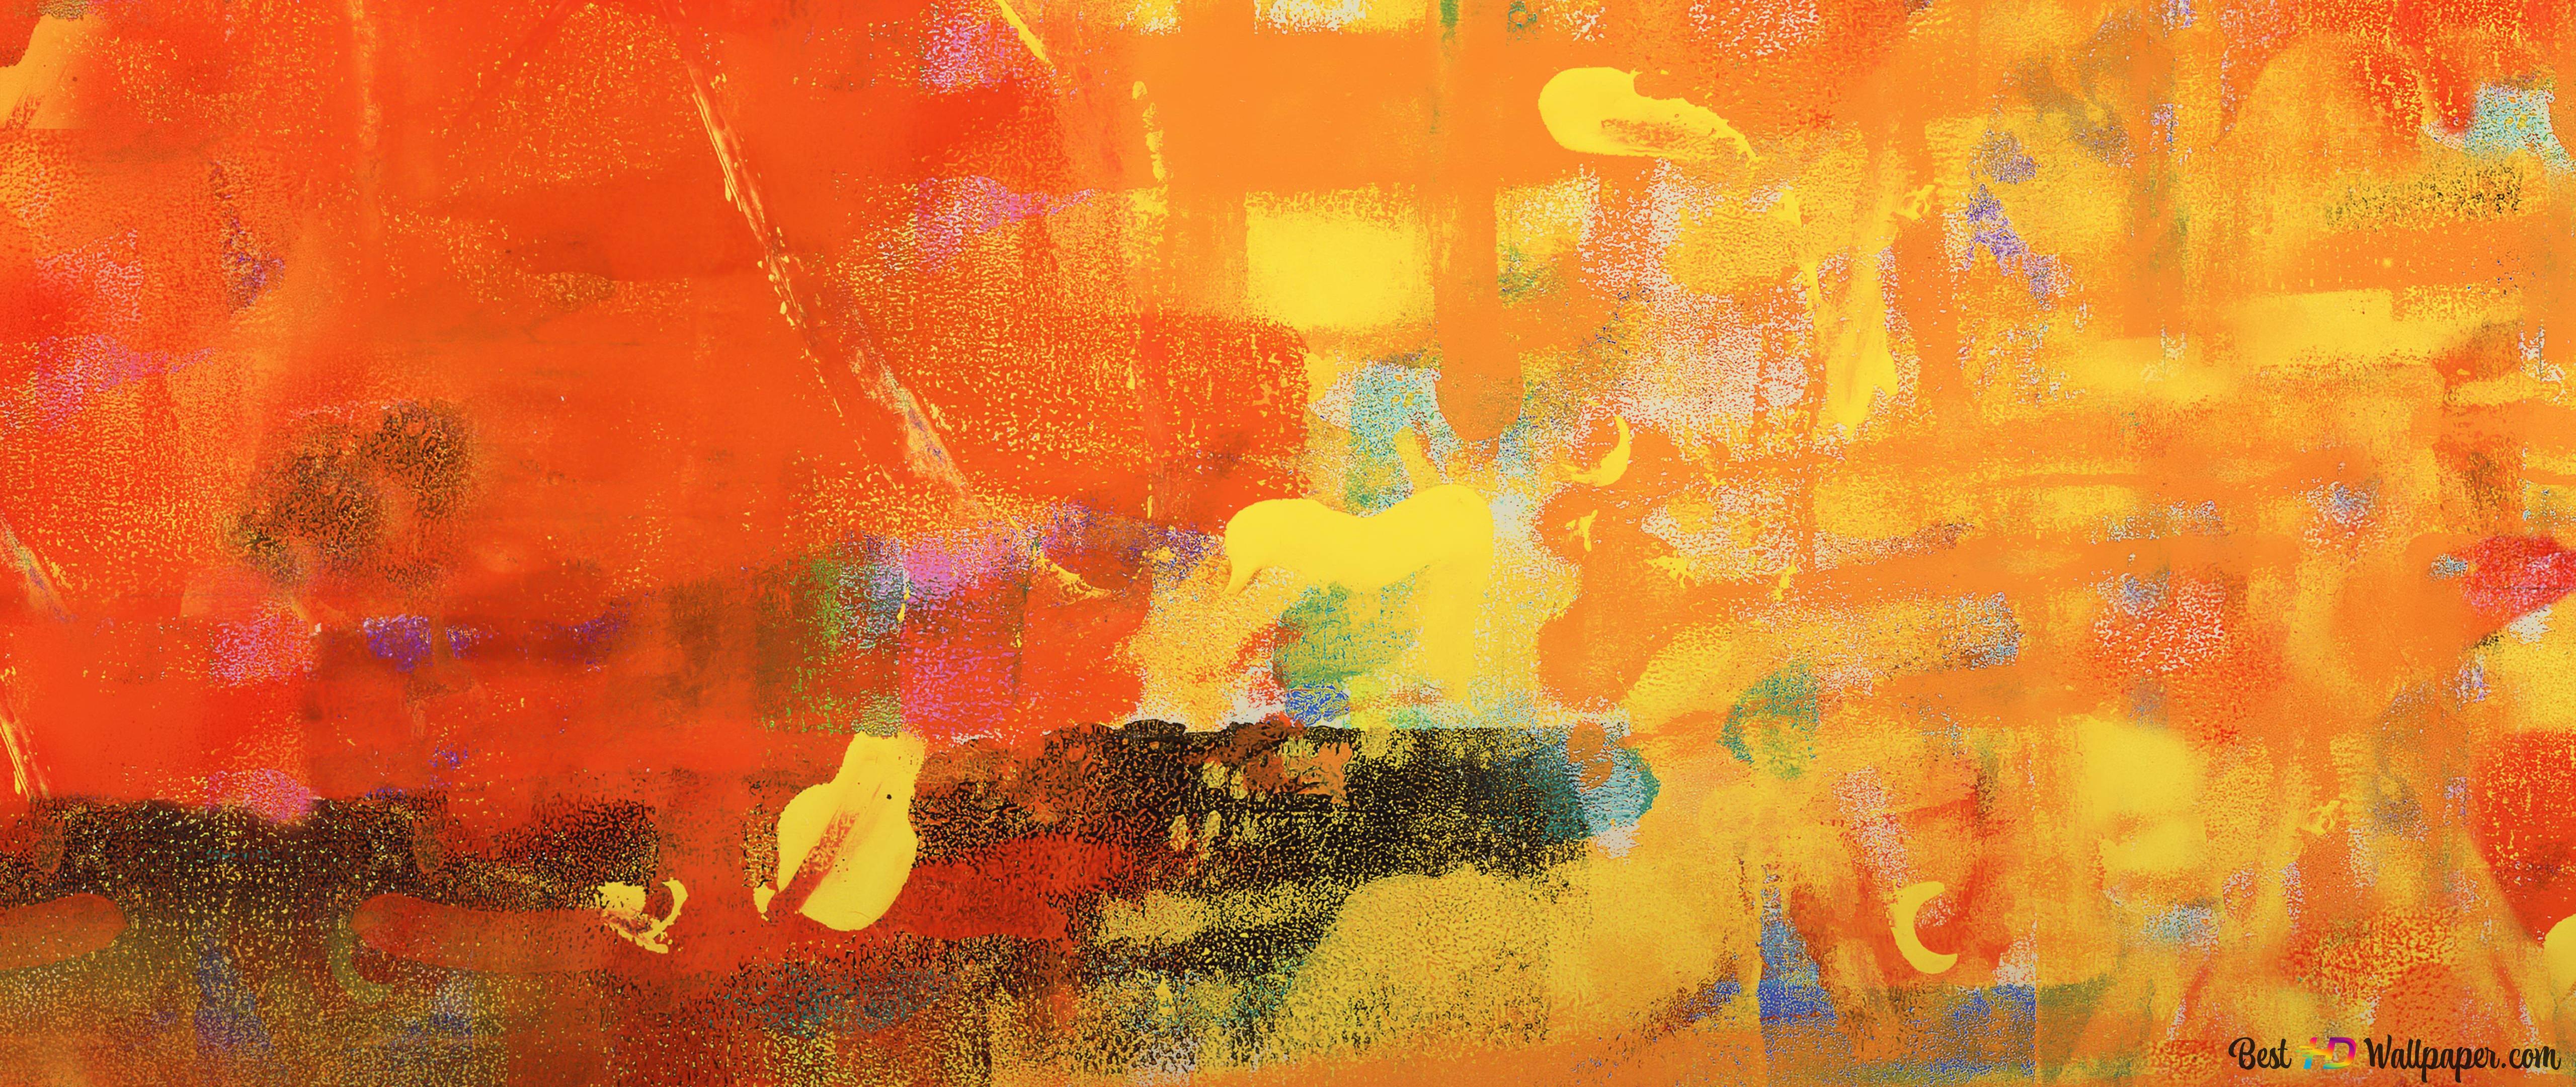 Orange Oil Paint HD Wallpaper Download